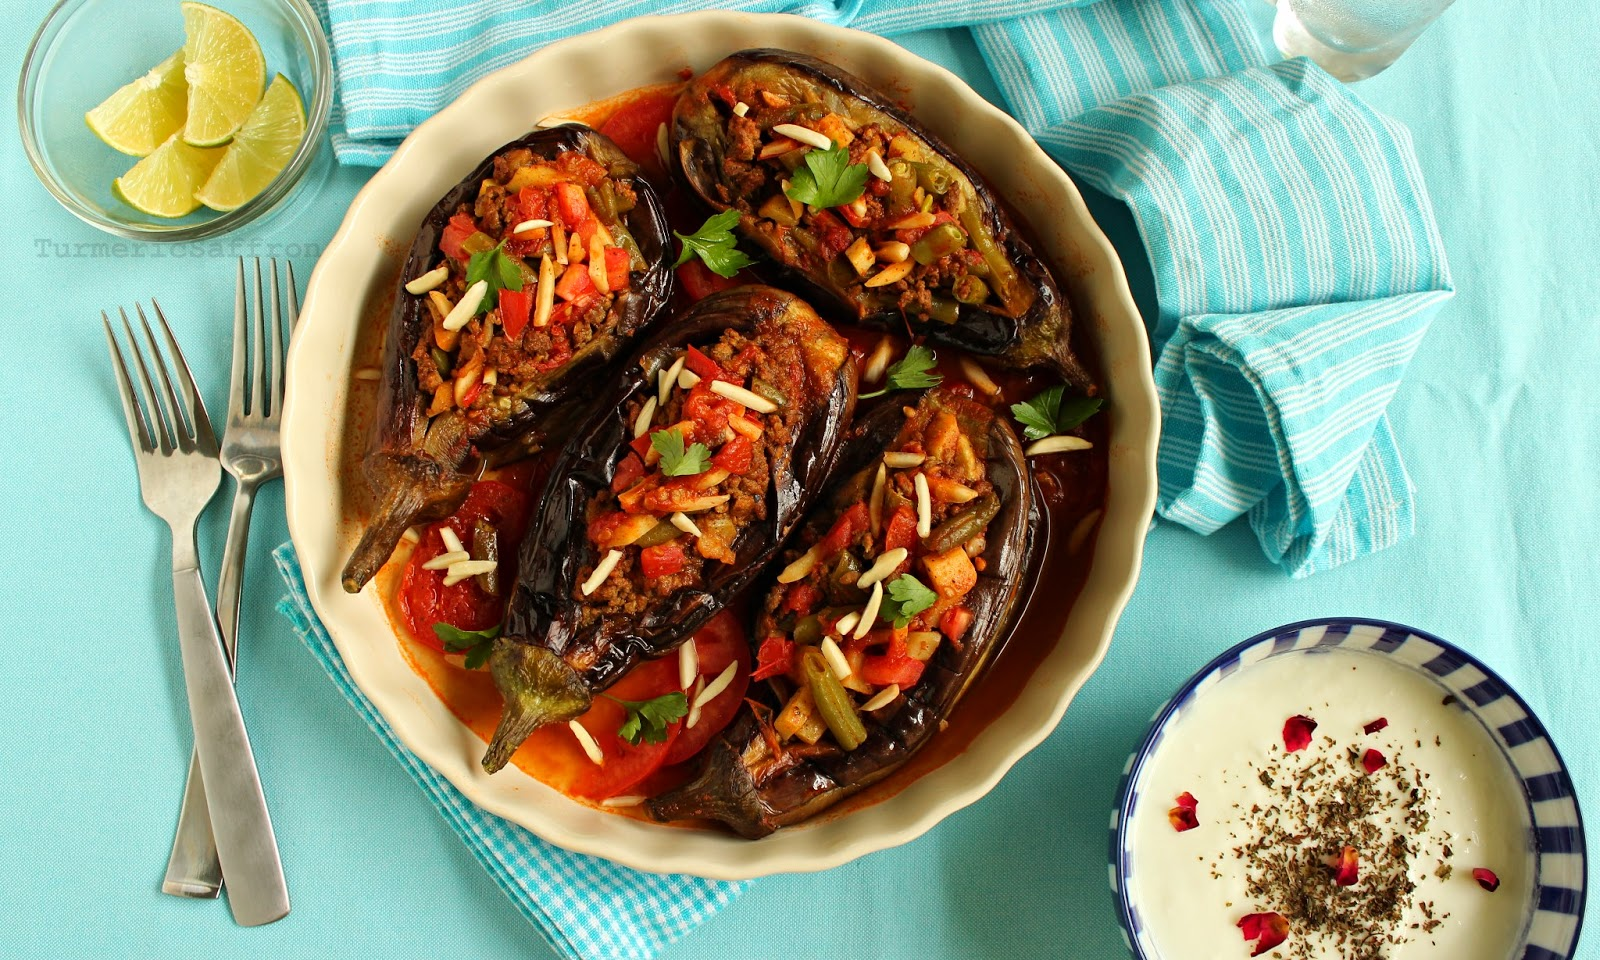 Баклажаны по-турецки с фаршем рецепт